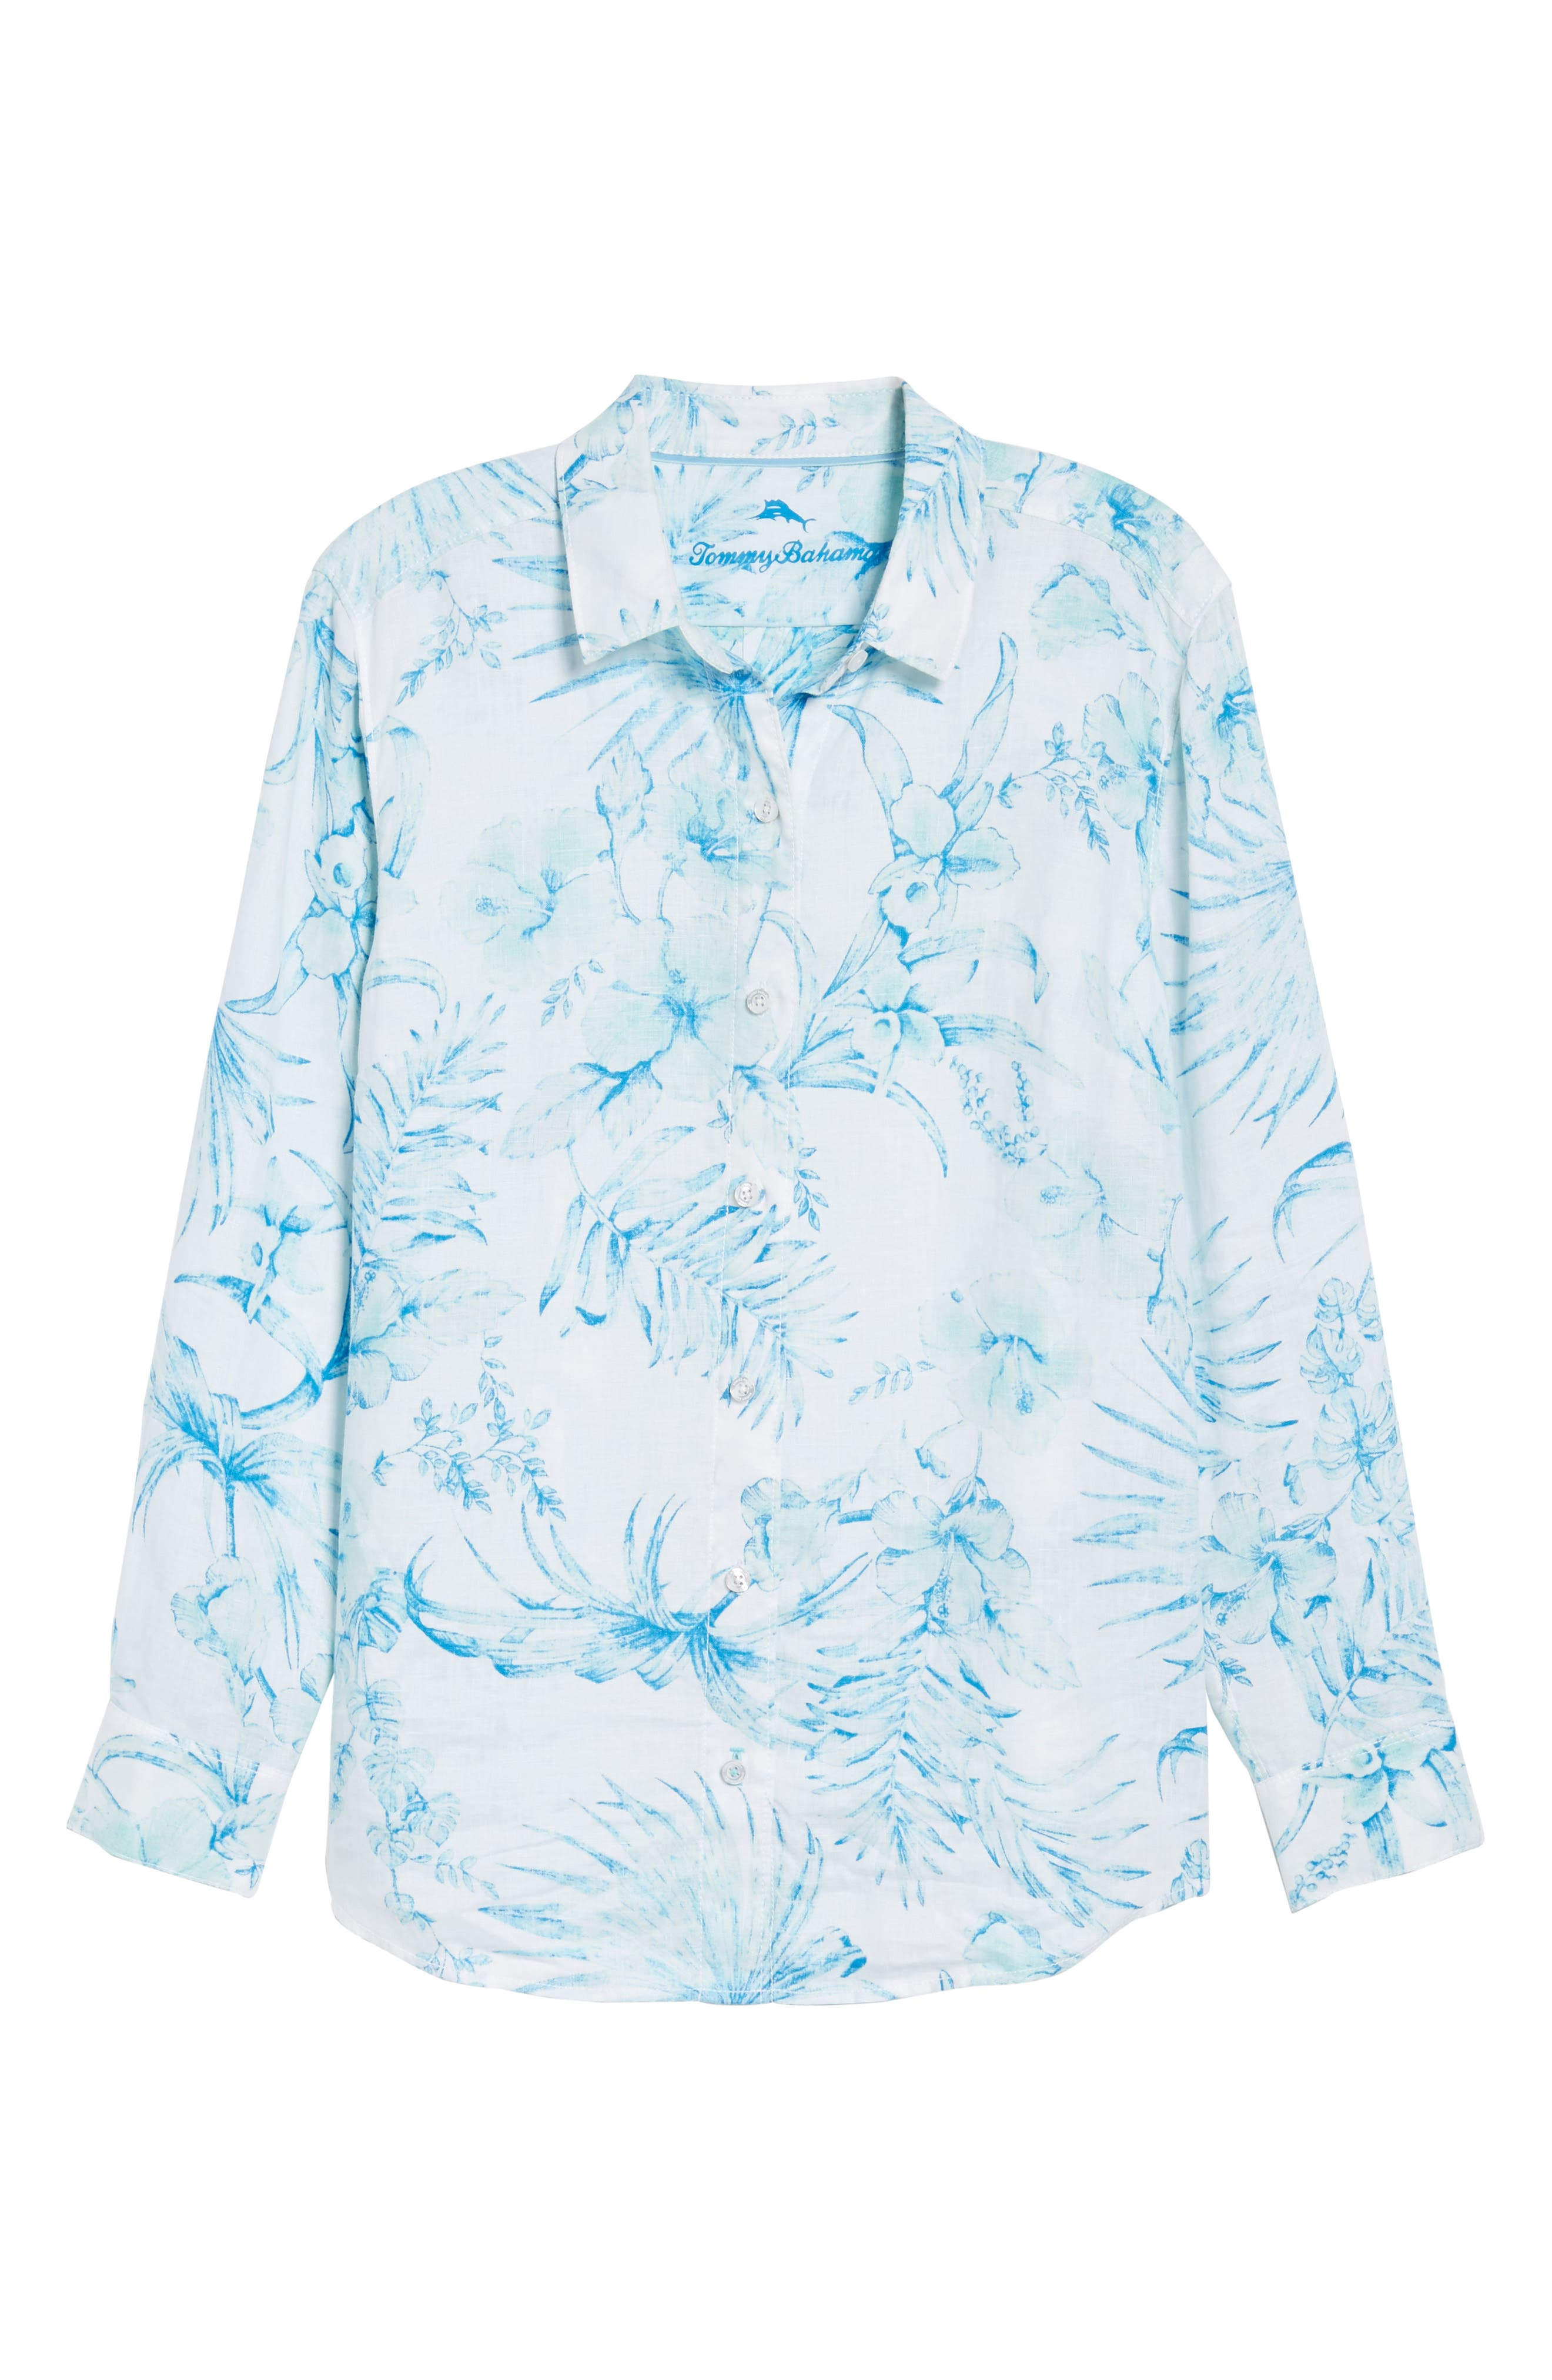 Tulum Tropical Linen Shirt,                             Alternate thumbnail 6, color,                             Blue Radiance